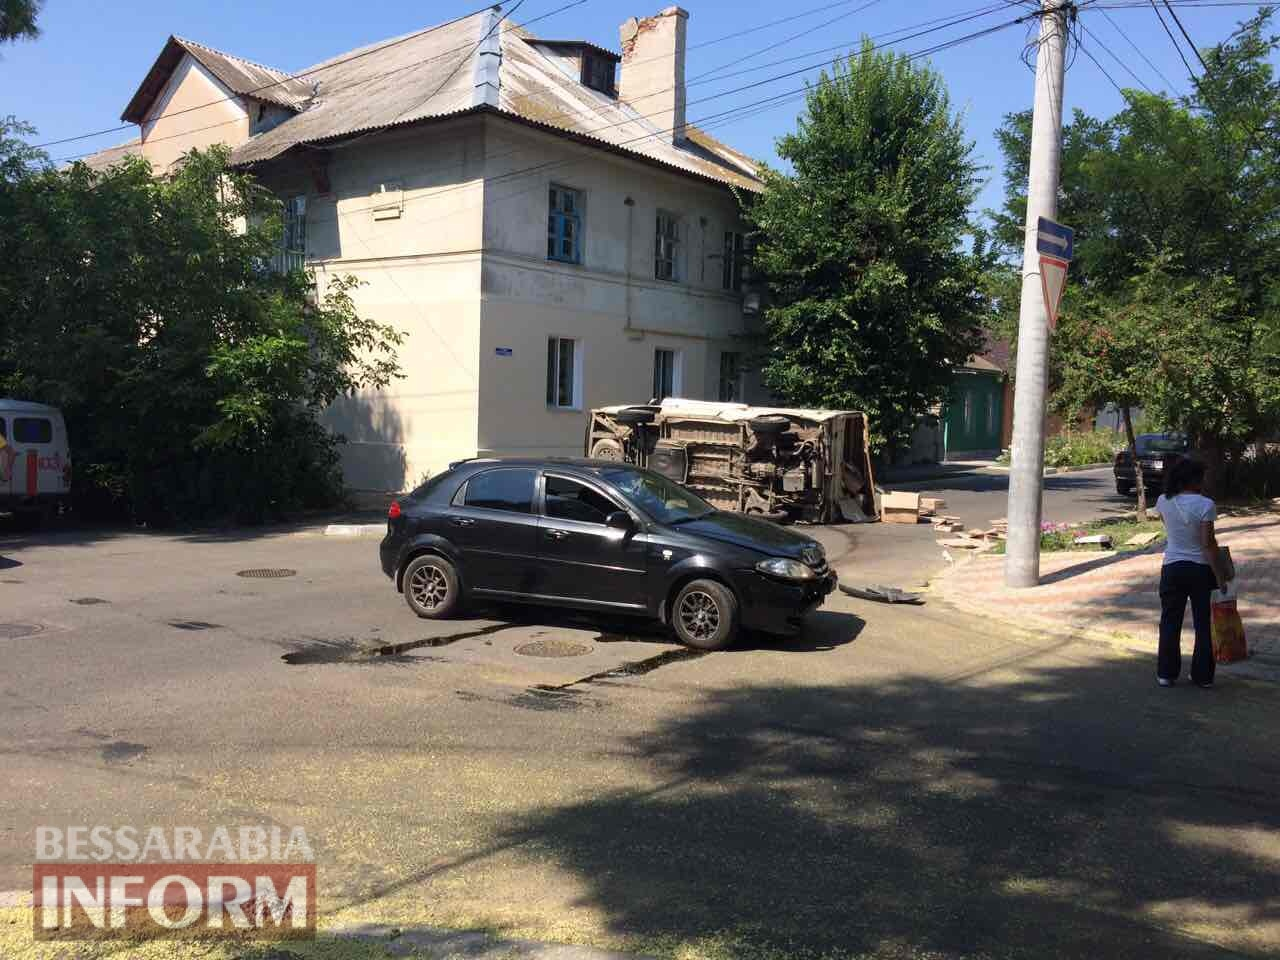 596f1fecb5cd2_23623625 ДТП в Измаиле: Chevrolet Lacetti завалил на бок грузовой микроавтобус